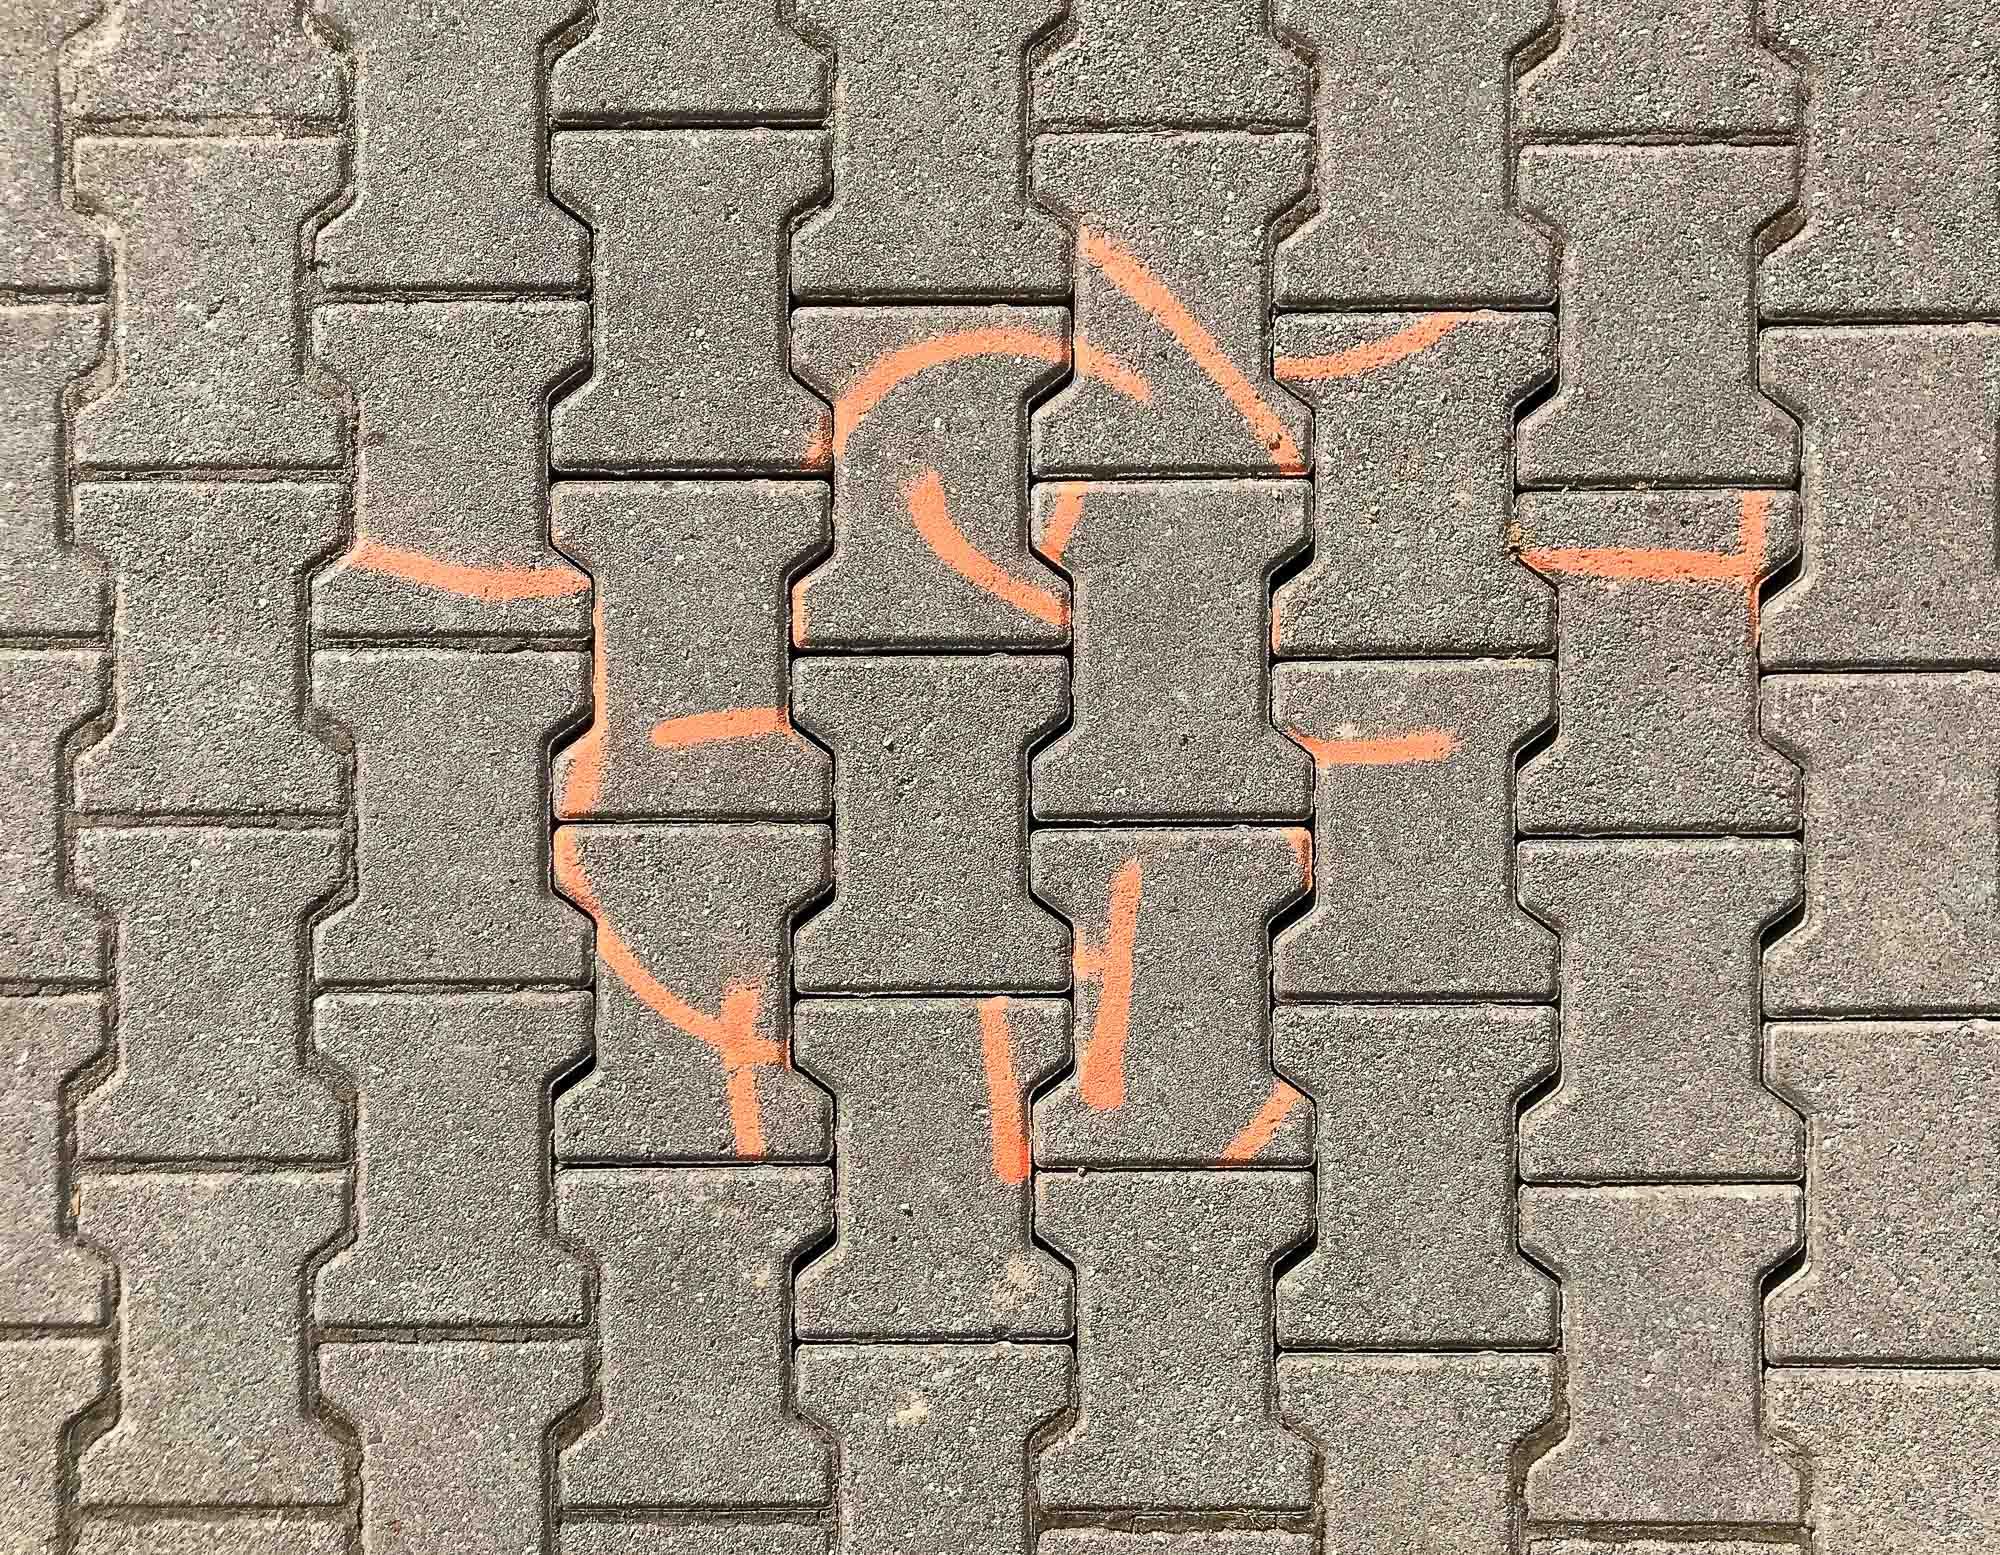 Lumivers / Puzzle falsch gemacht!